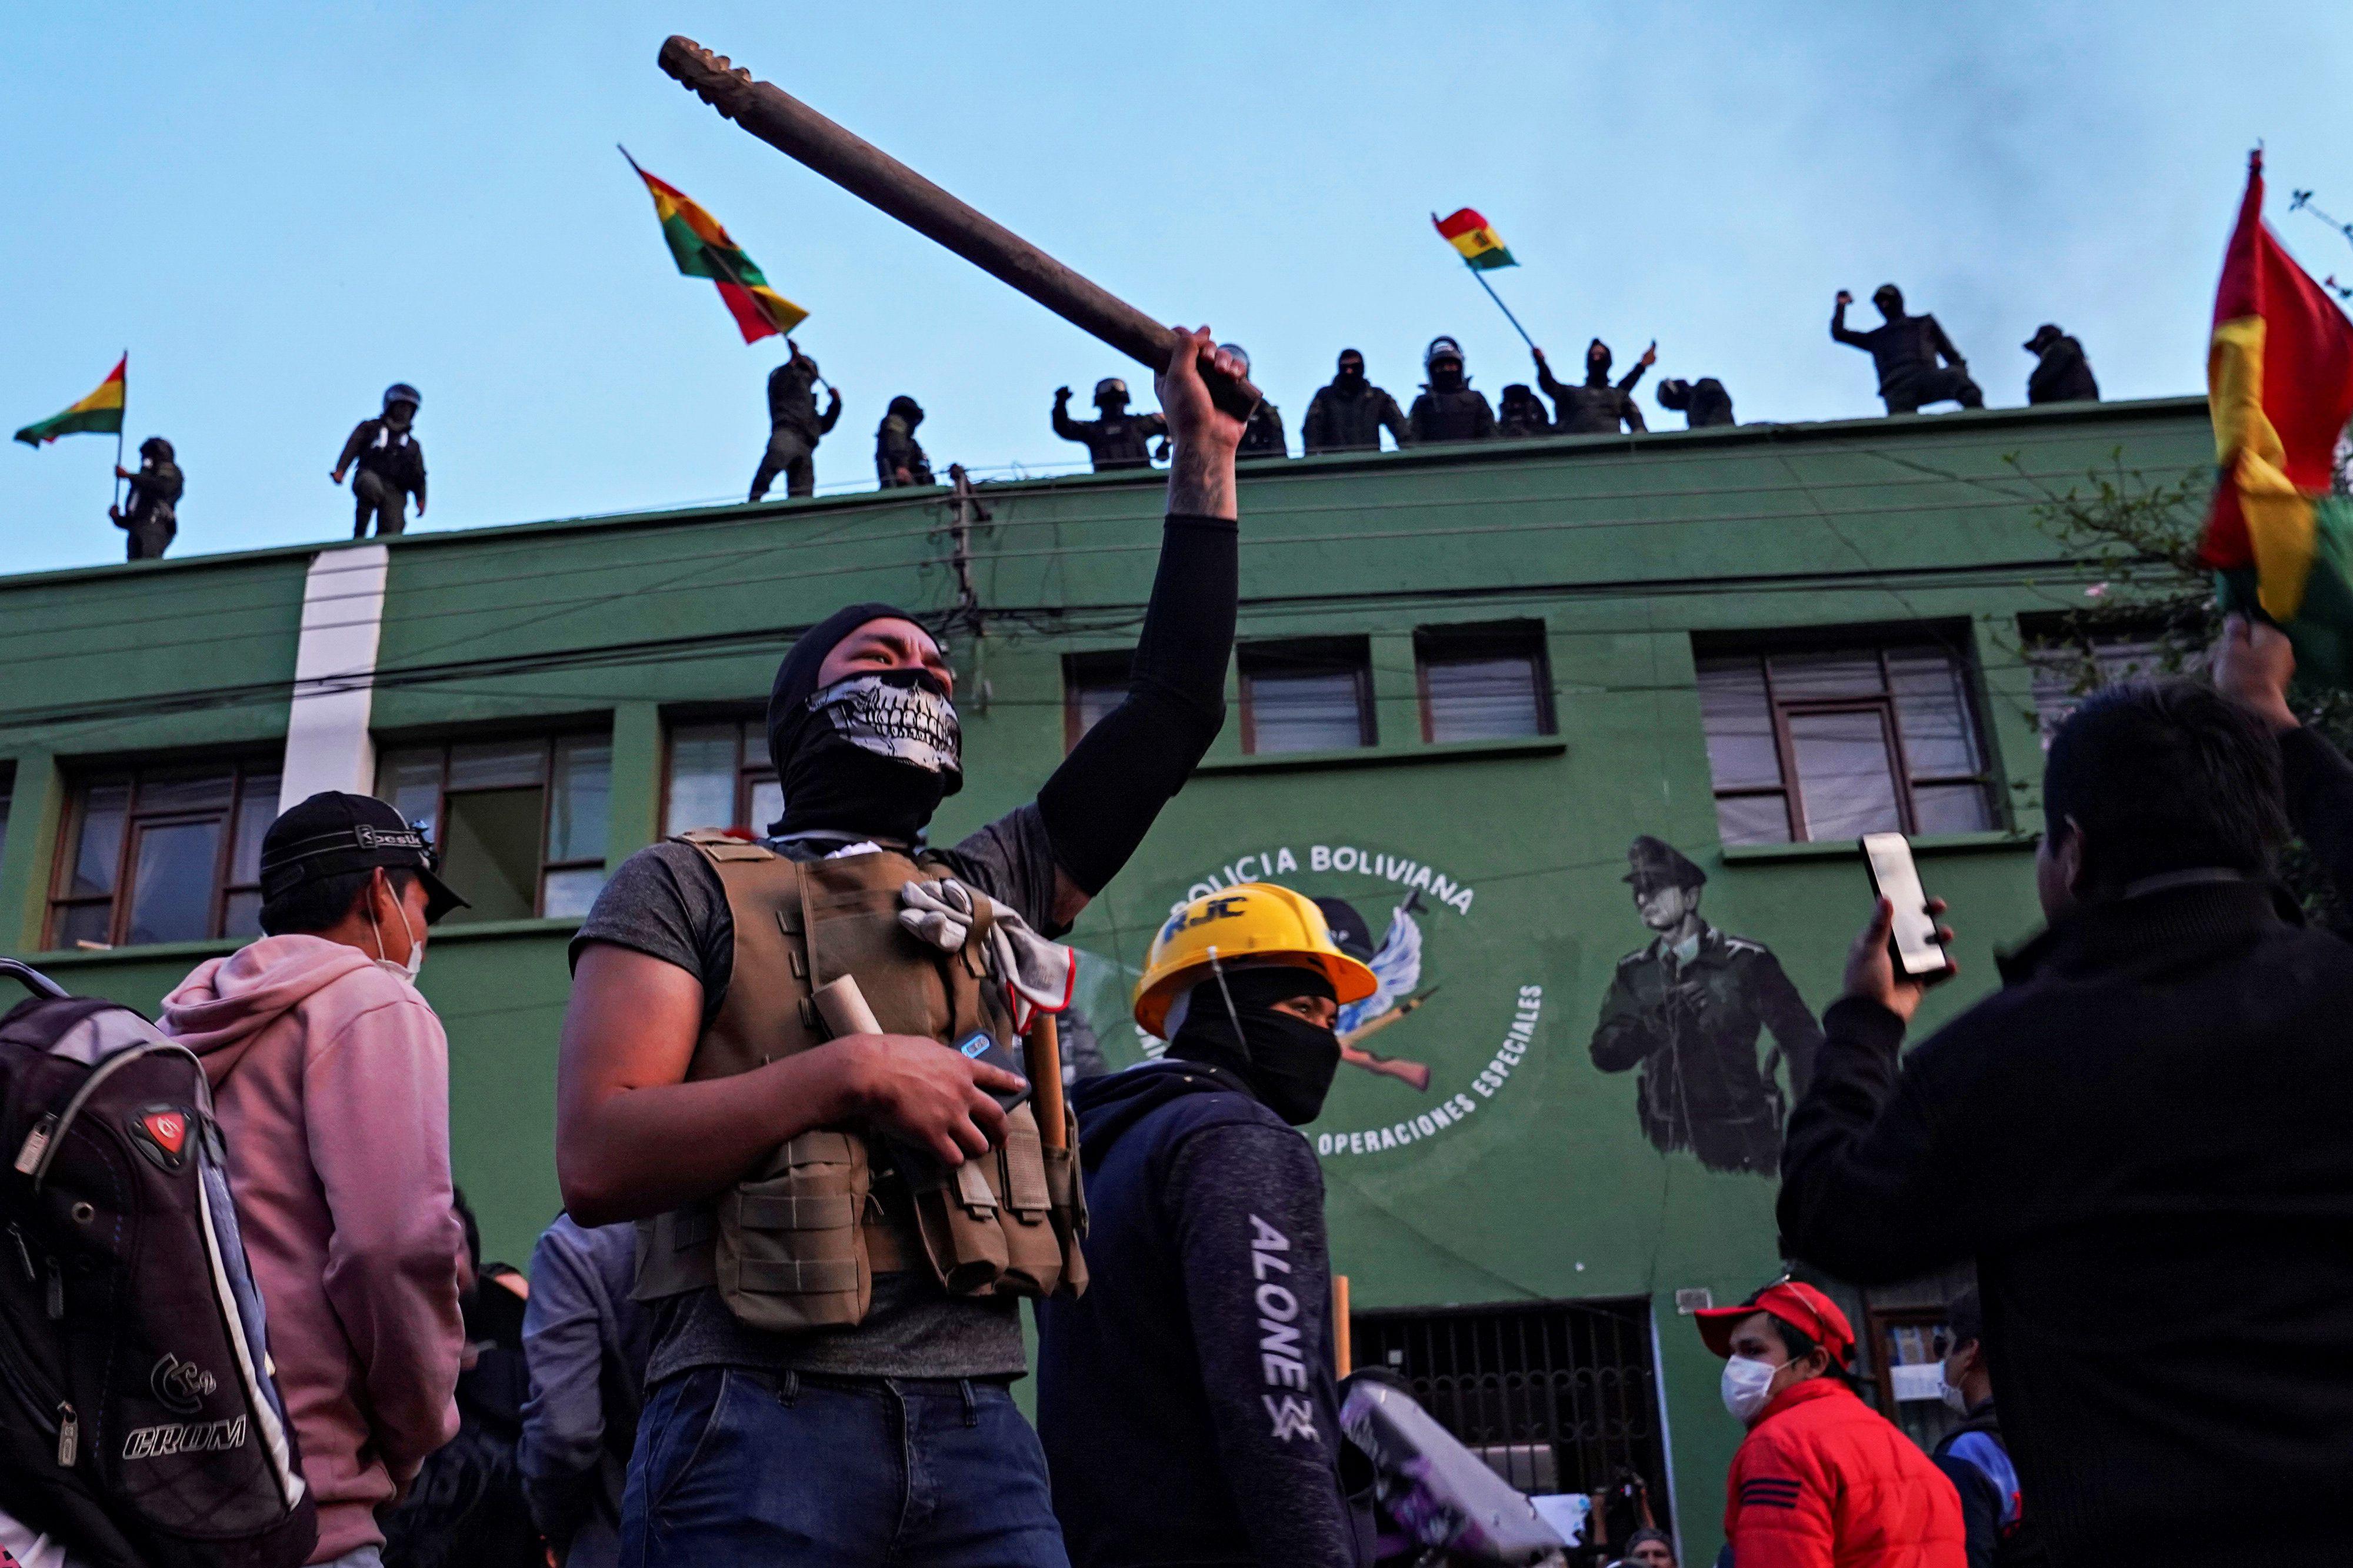 Policías amotinado en Cochabamba, Bolivia. (Fotos: REUTERS)